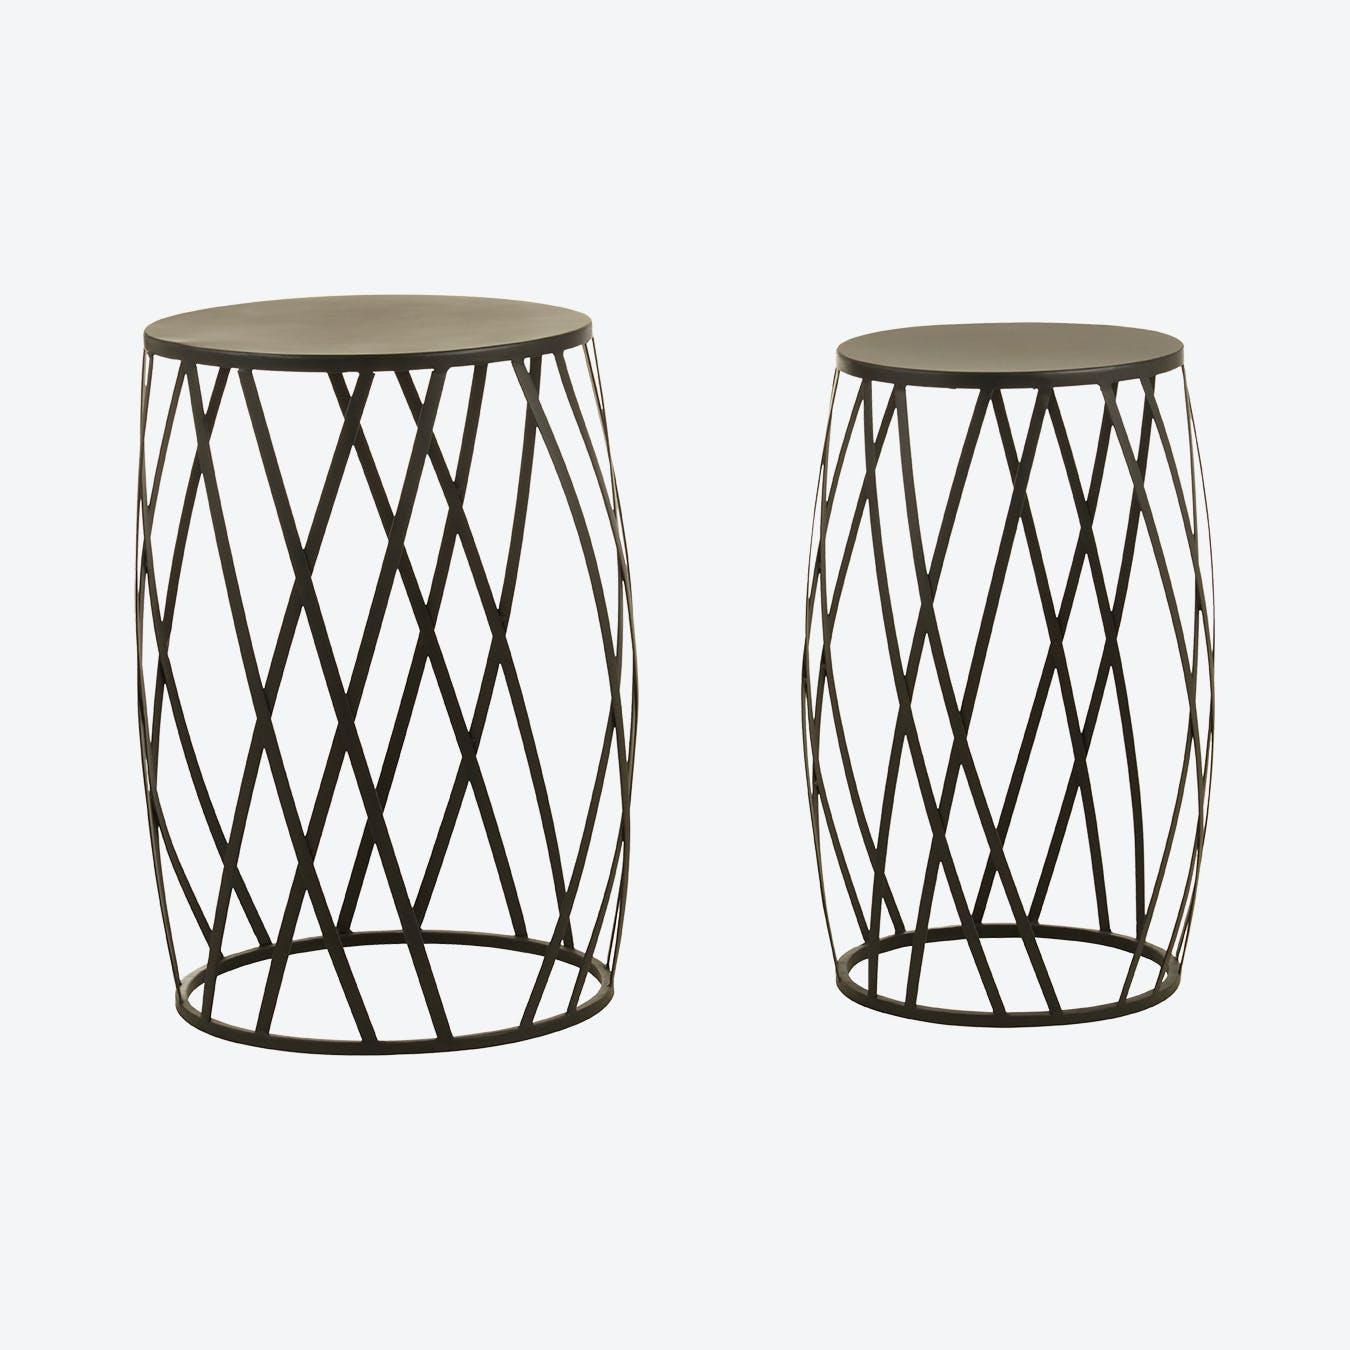 Avantis Set of 2 Tall Side Tables